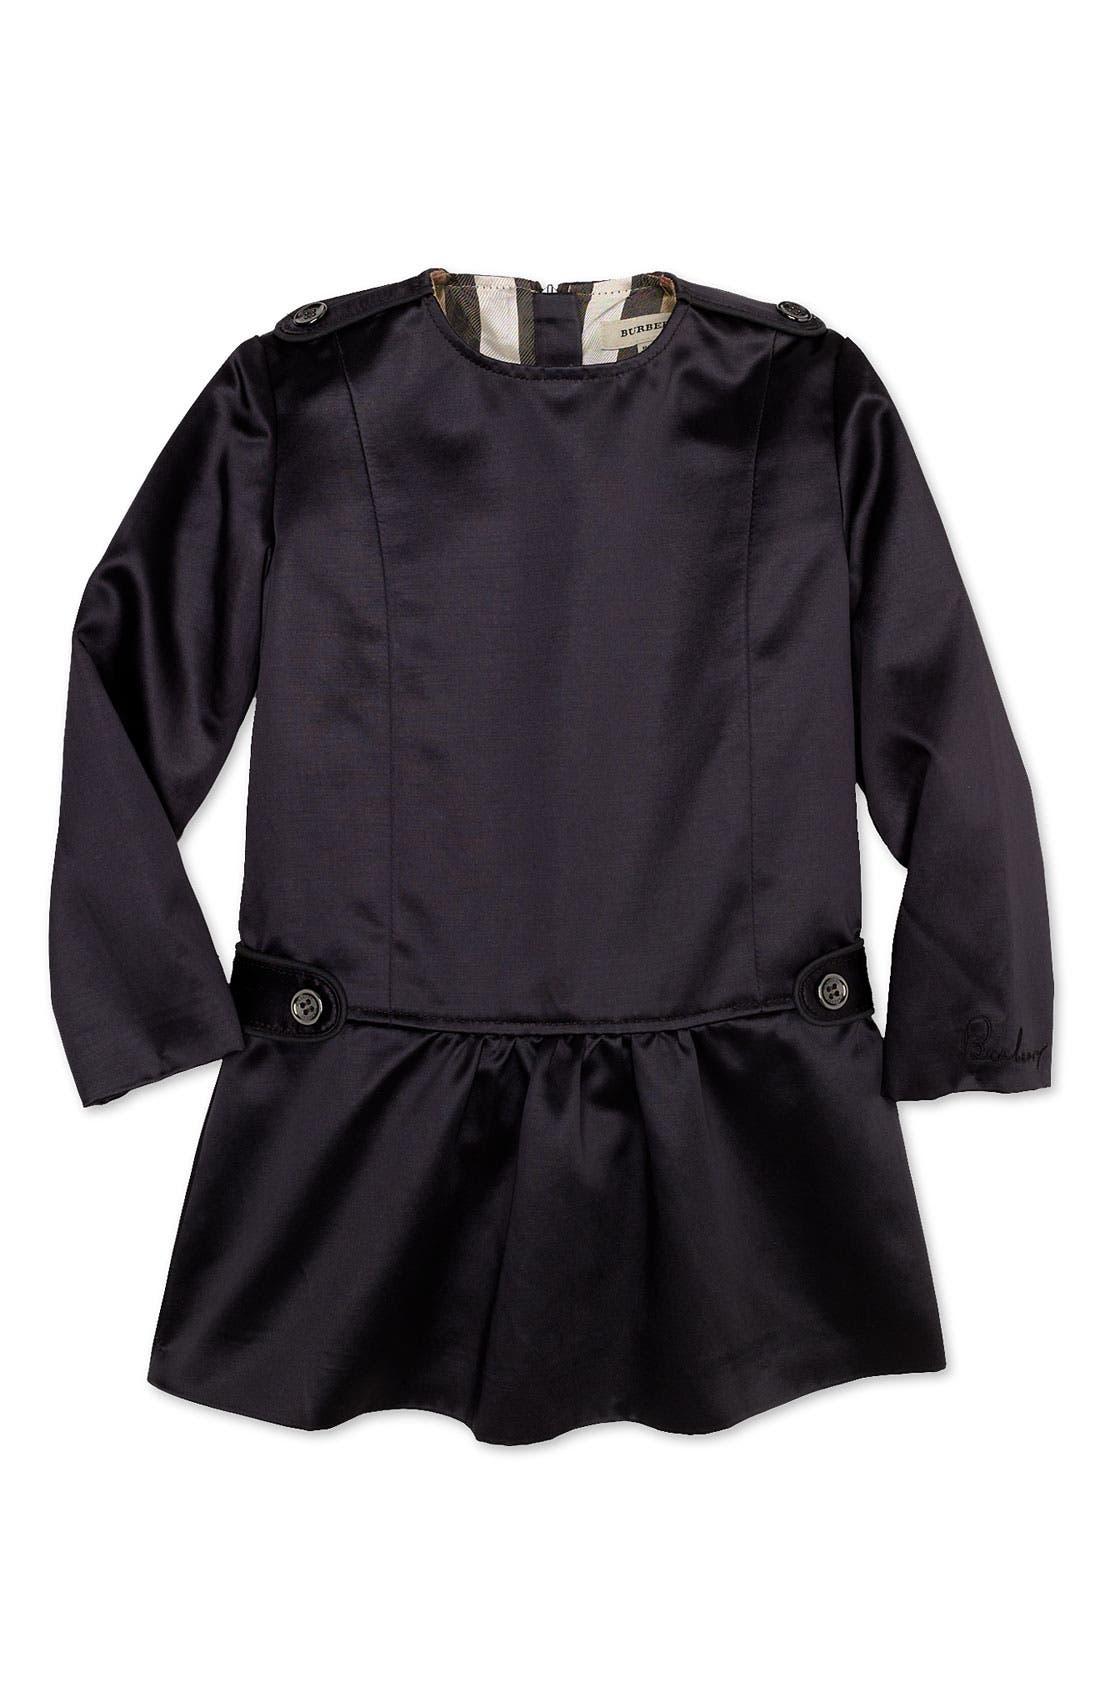 Alternate Image 1 Selected - Burberry Satin Dress (Infant)